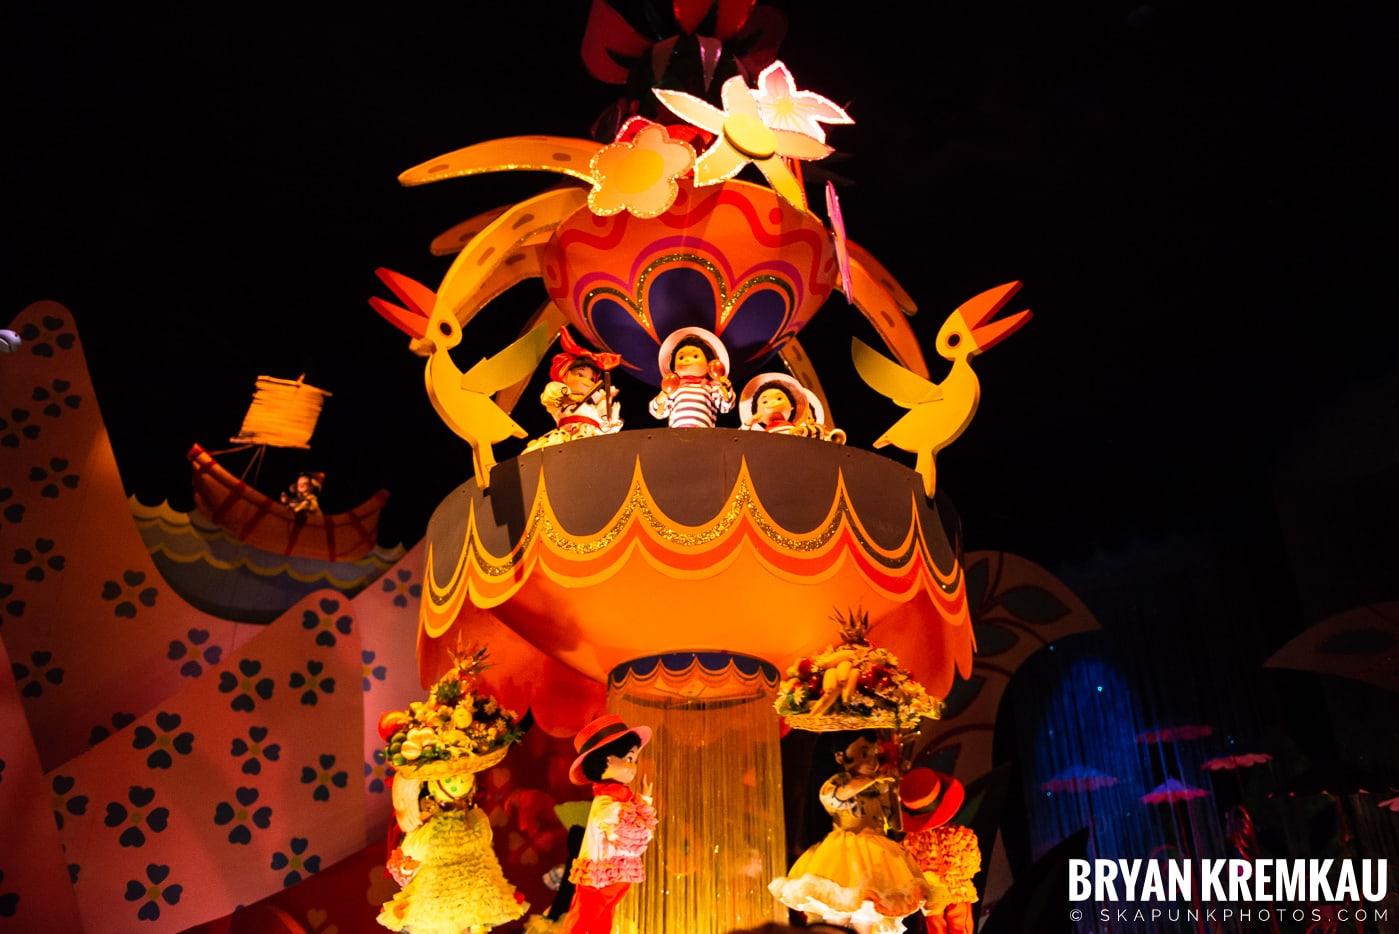 Walt Disney World Vacation: Days 1 & 2 (Disney Springs & Magic Kingdom, Epcot) September 29th - 30th 2019 (25)